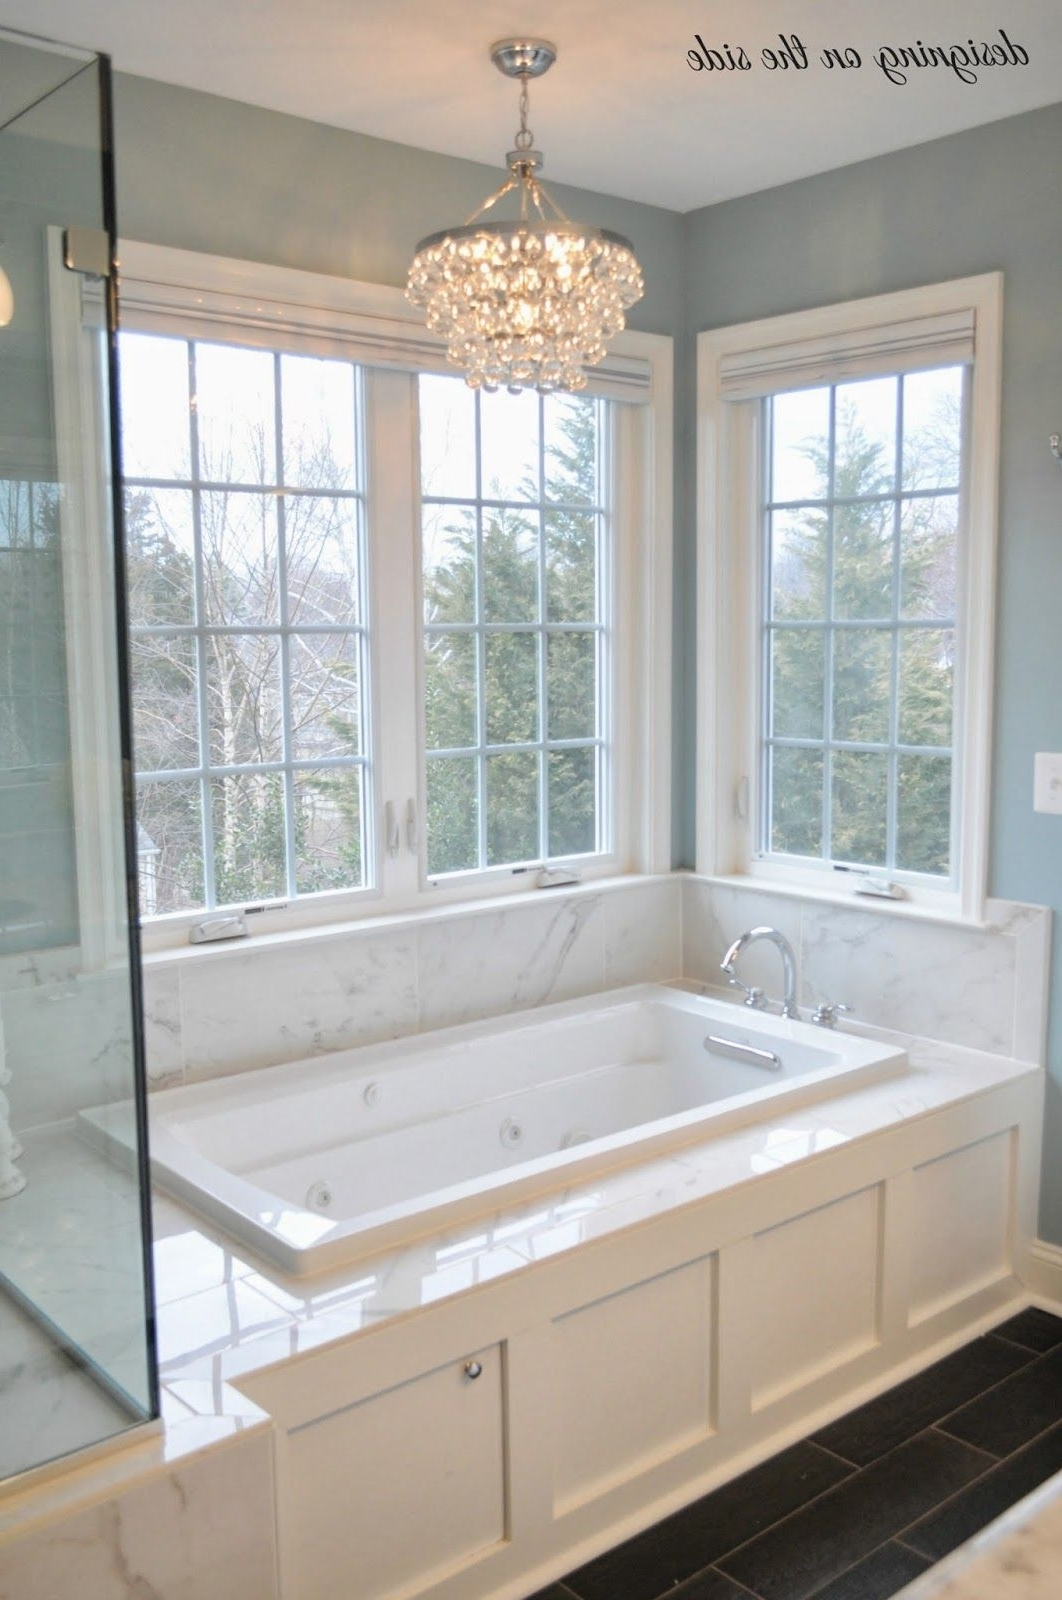 2017 Chandelier Bathroom Lighting Fixtures Within Master Bath, Marble Tile, Sw Rain, Crystal Chandelier, Tile That (View 2 of 15)